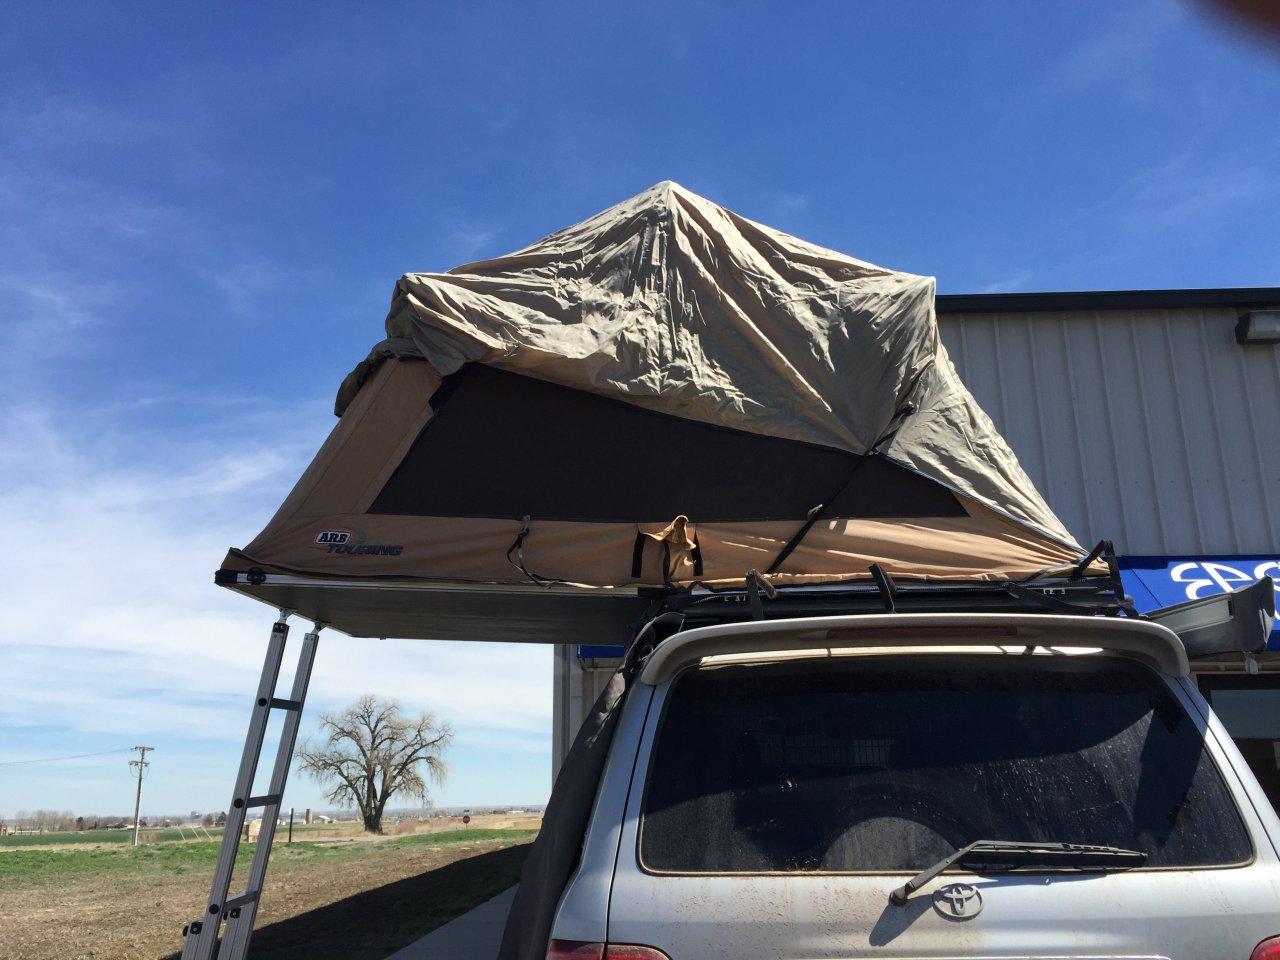 for sale arb kakadu roof top tent for sale colorado. Black Bedroom Furniture Sets. Home Design Ideas